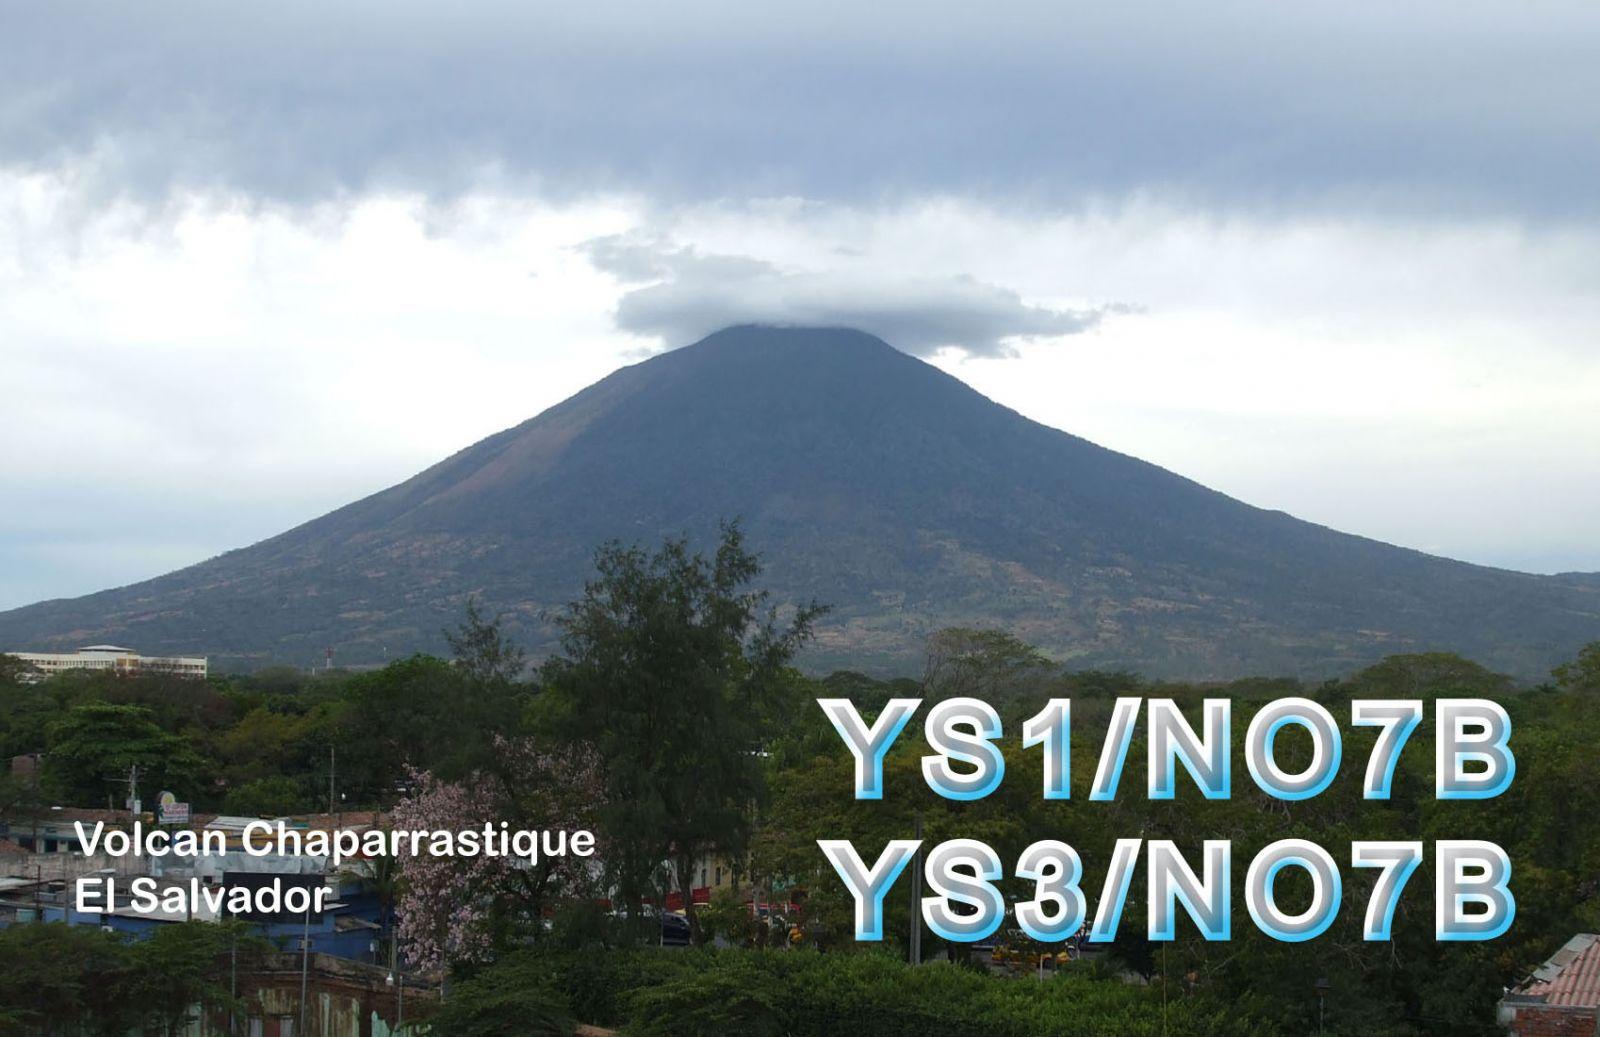 Эль Сальвадор YS1/NO7B